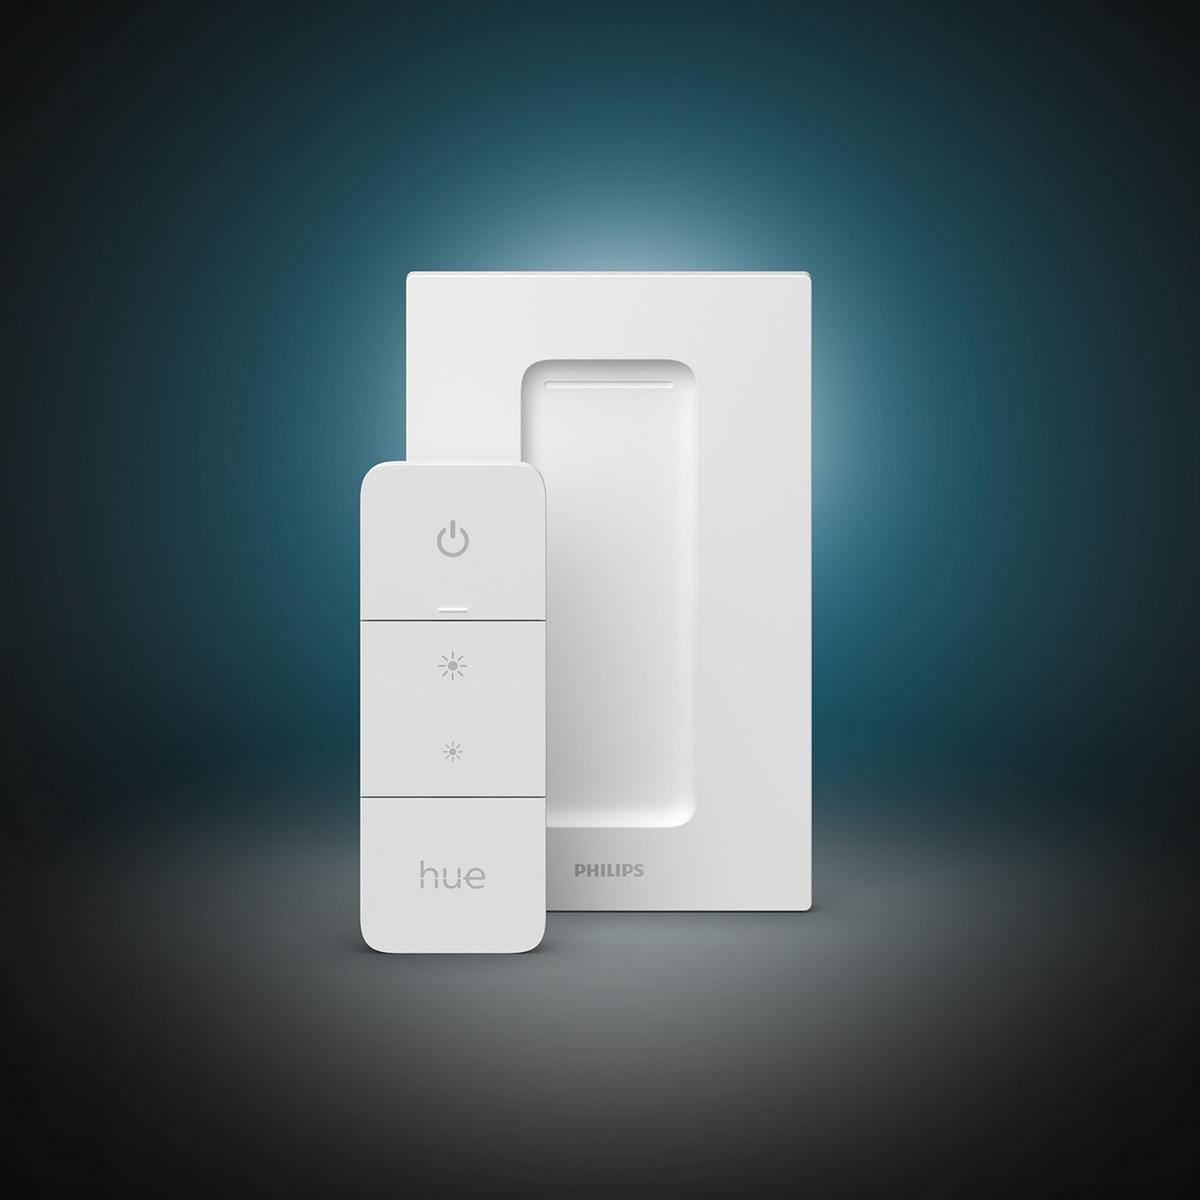 O novo dimmer/controle remoto da Philips Hue passa na Anatel